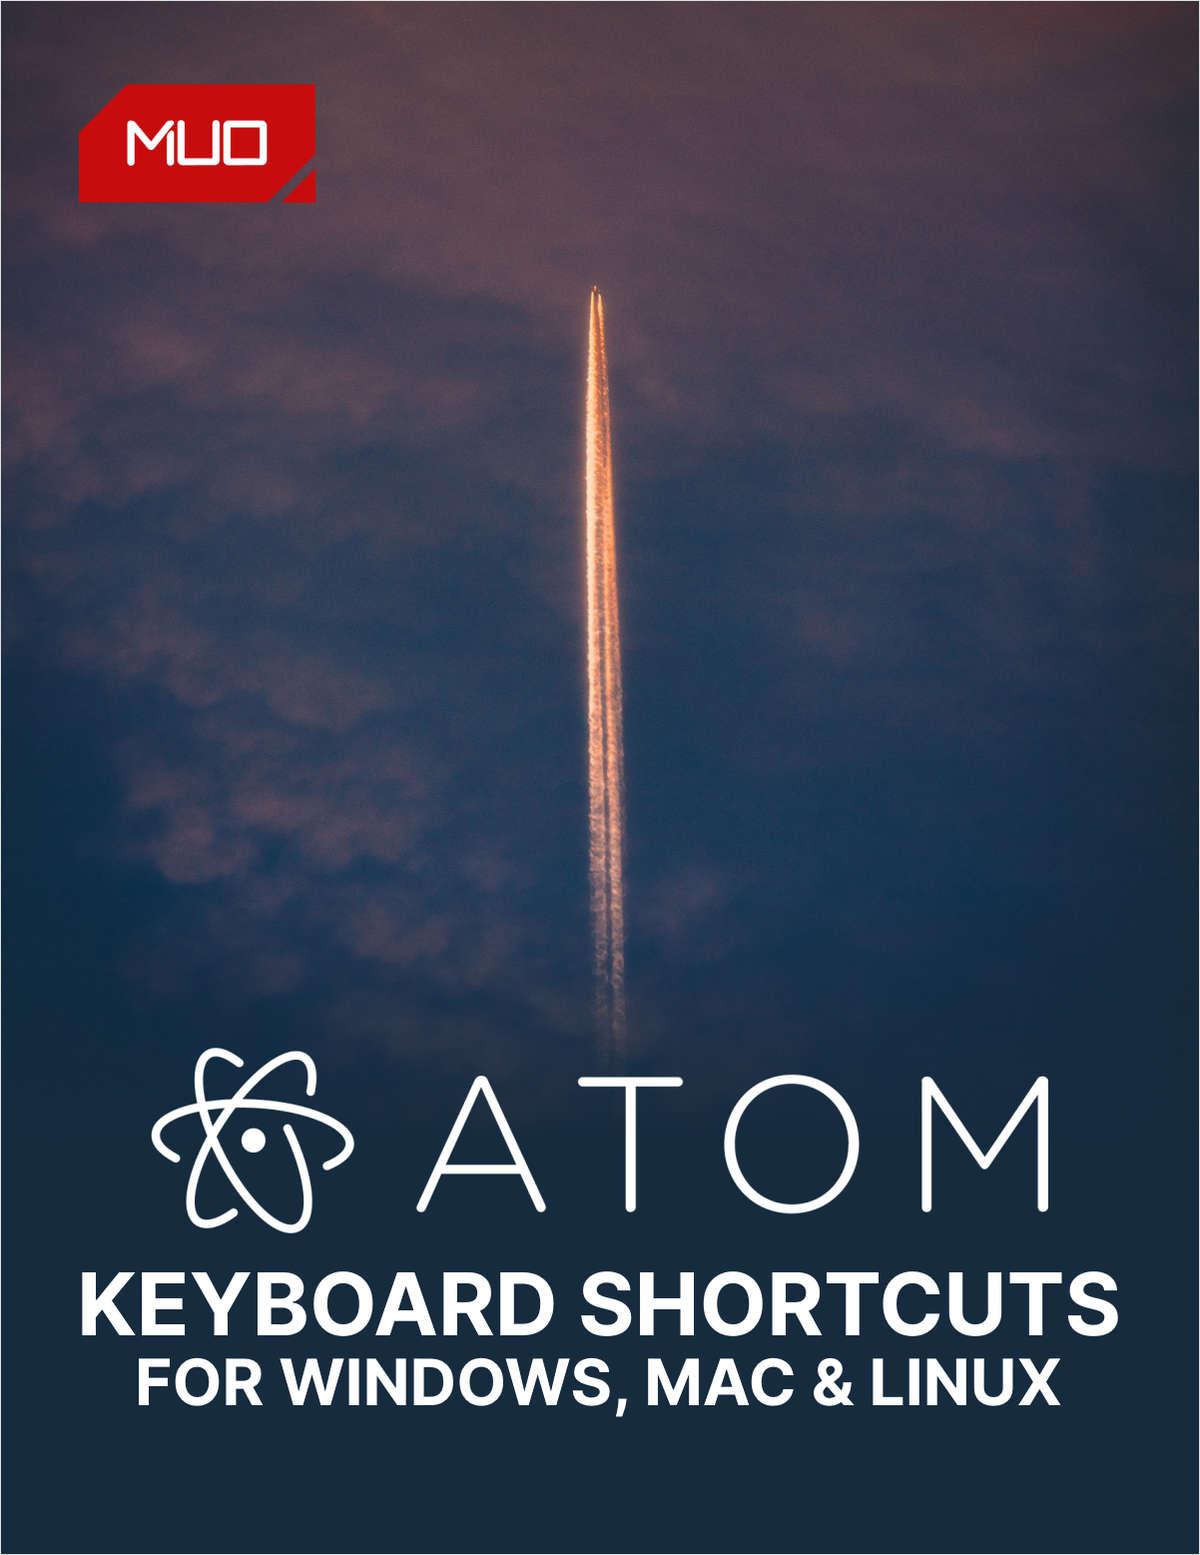 Atom Keyboard Shortcuts Cheat Sheet for Windows, Mac, and Linux